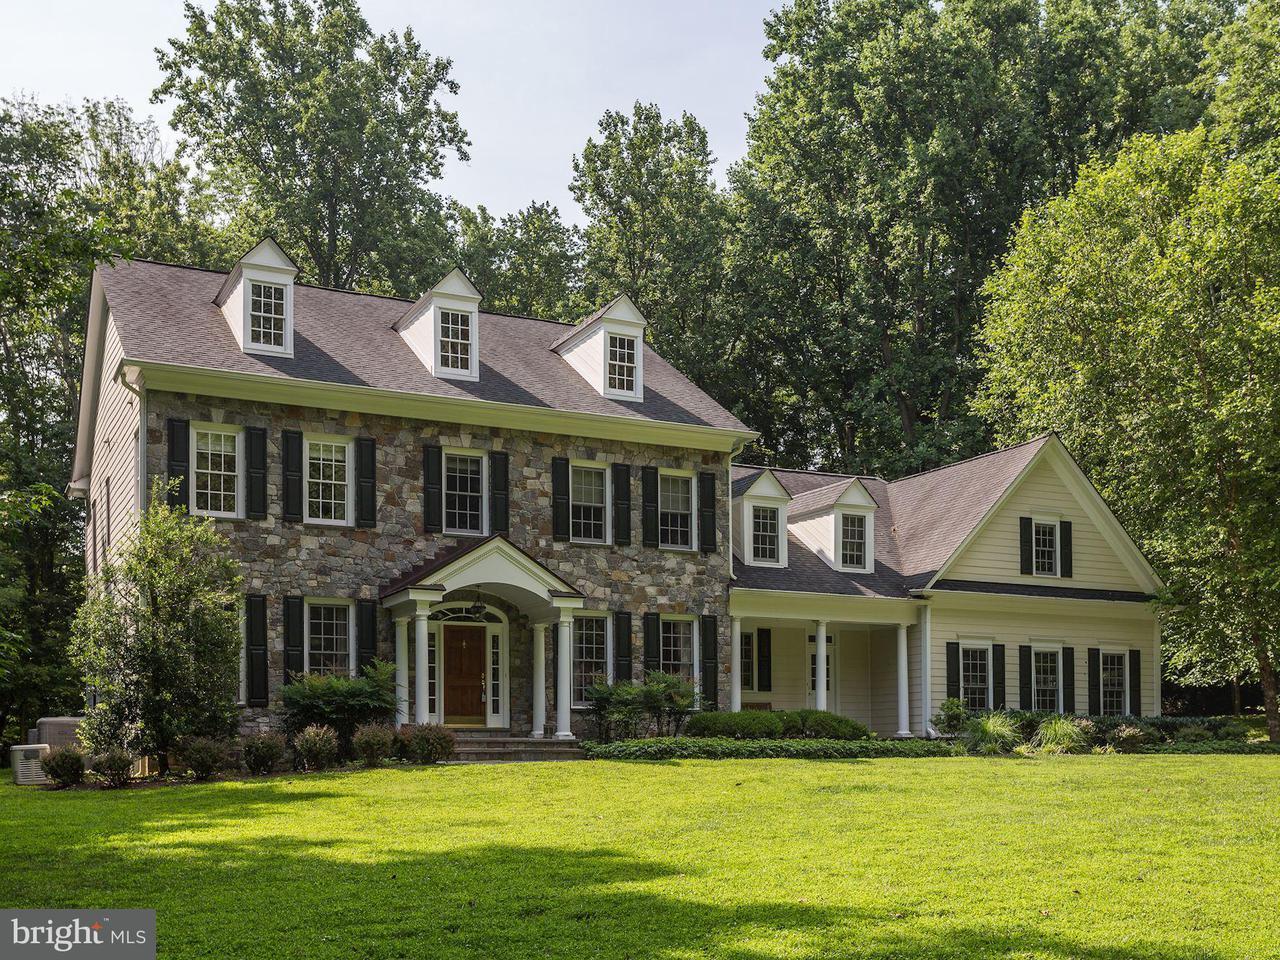 獨棟家庭住宅 為 出售 在 310 HAVILAND MILL Road 310 HAVILAND MILL Road Brookeville, 馬里蘭州 20833 美國